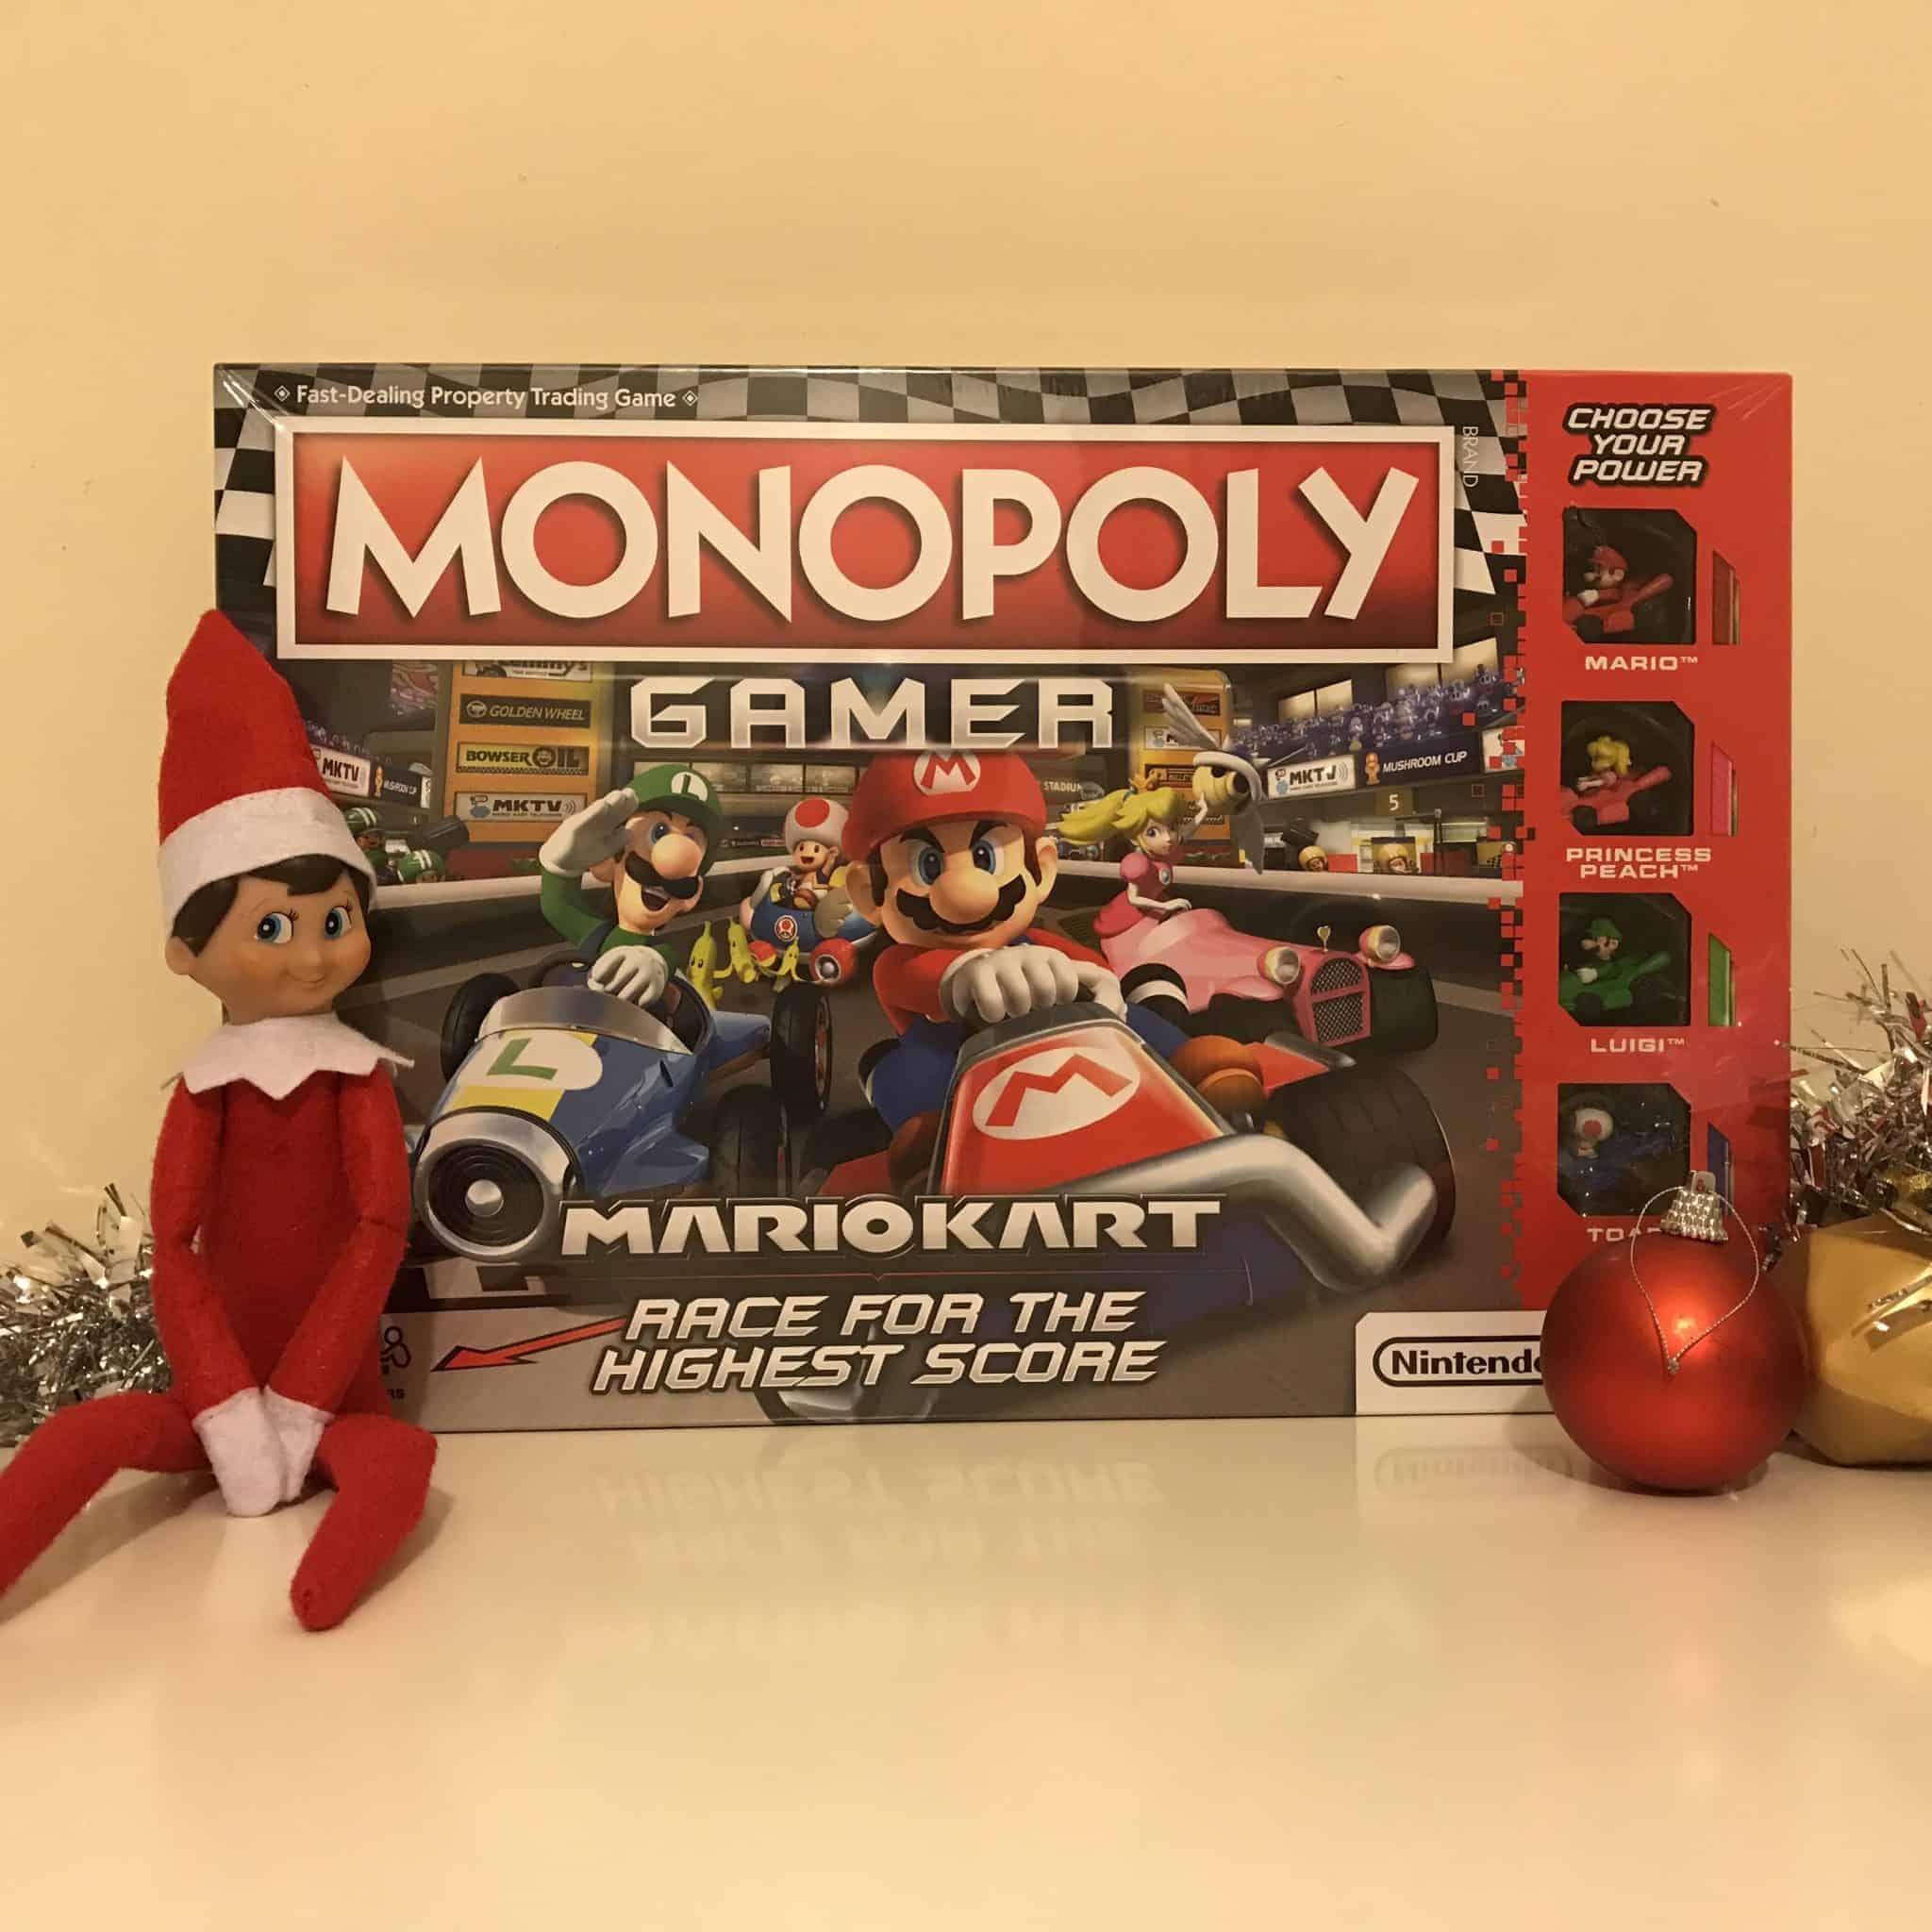 mariokart monopoly